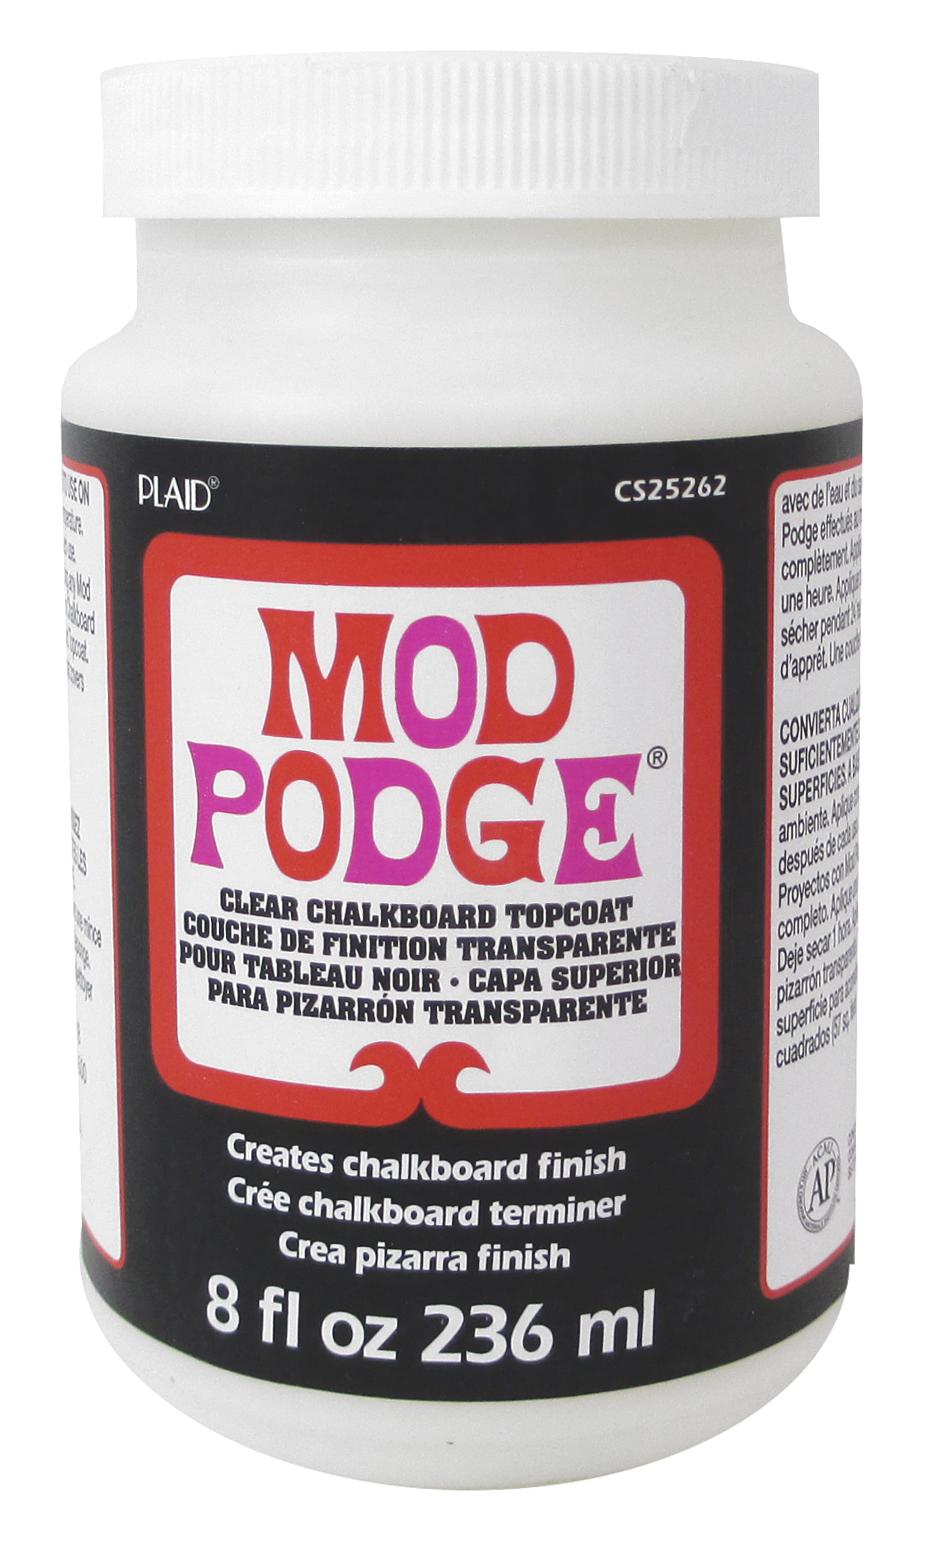 Mod Podge Chalkboard Topcoat - 8oz